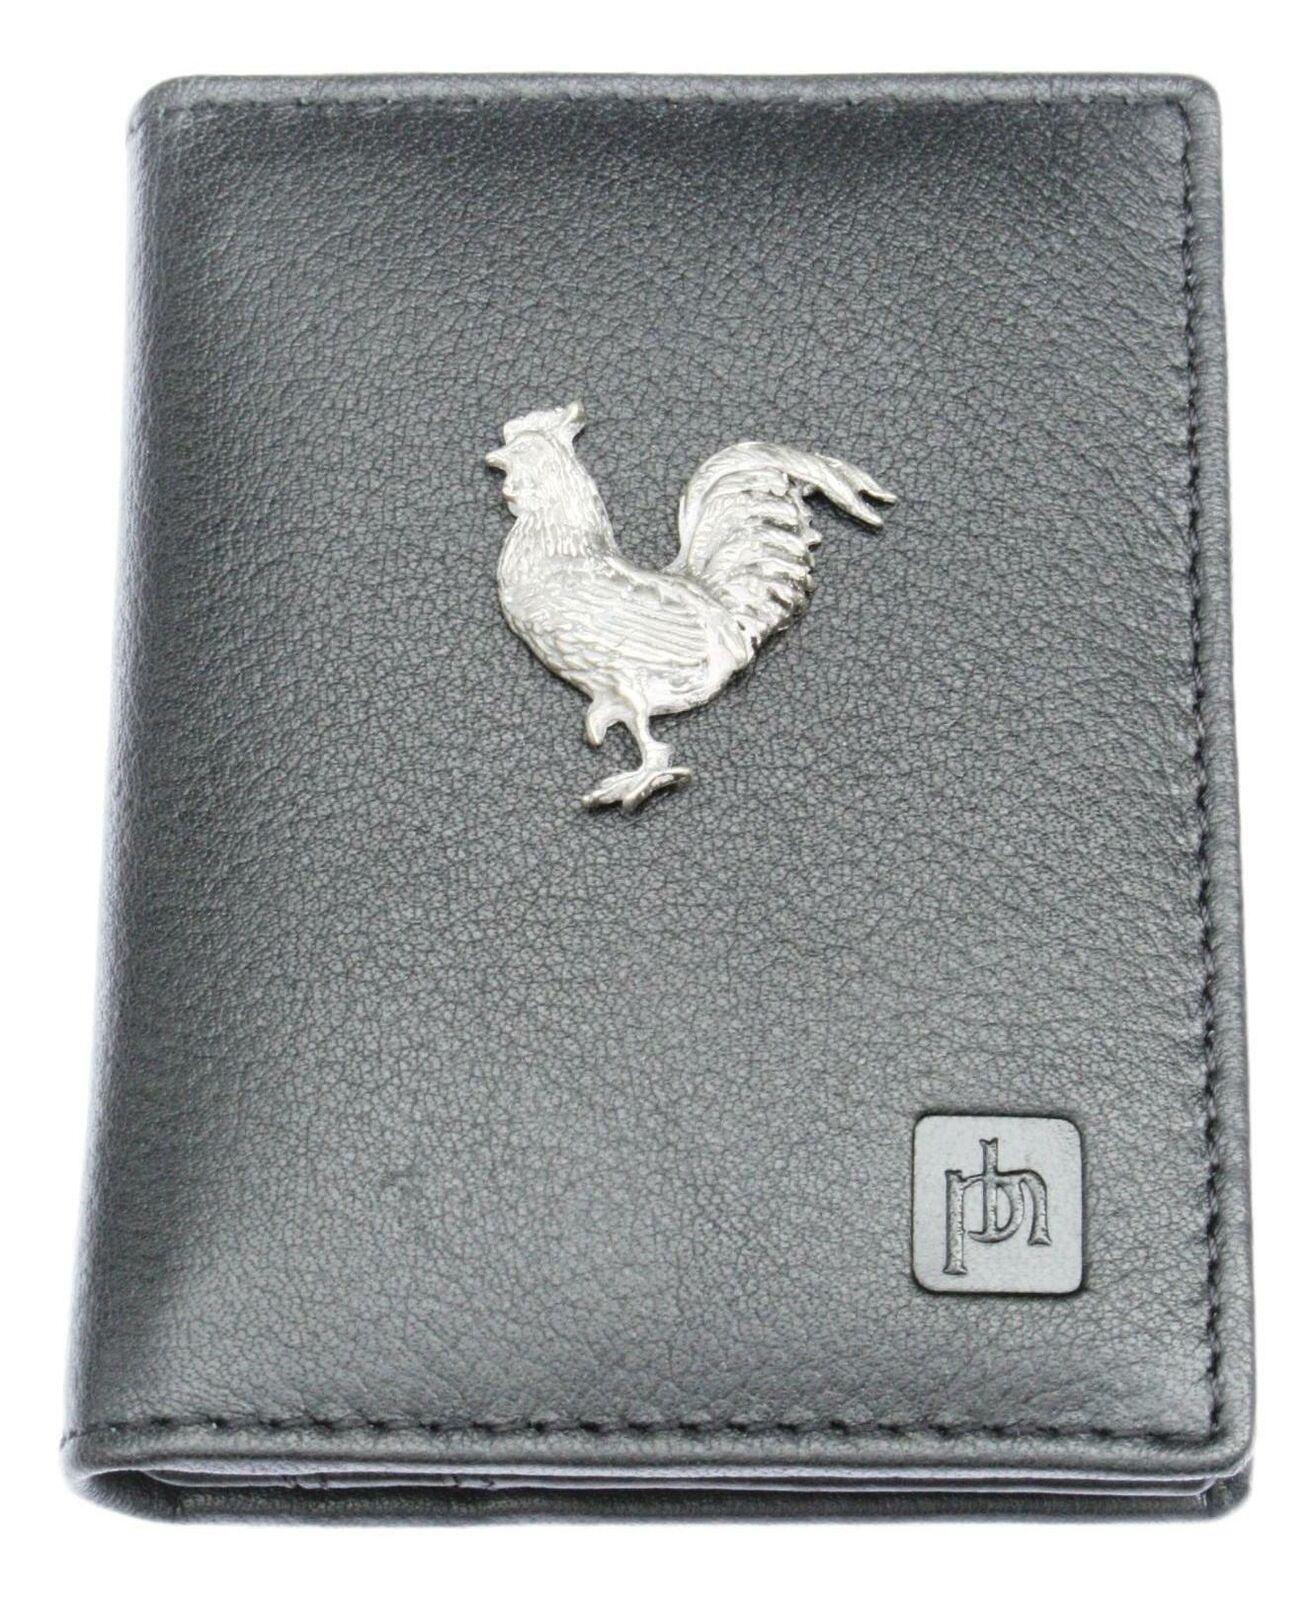 Chicken Bifold Card Holder Leather Black Wallet RFID Safe 71